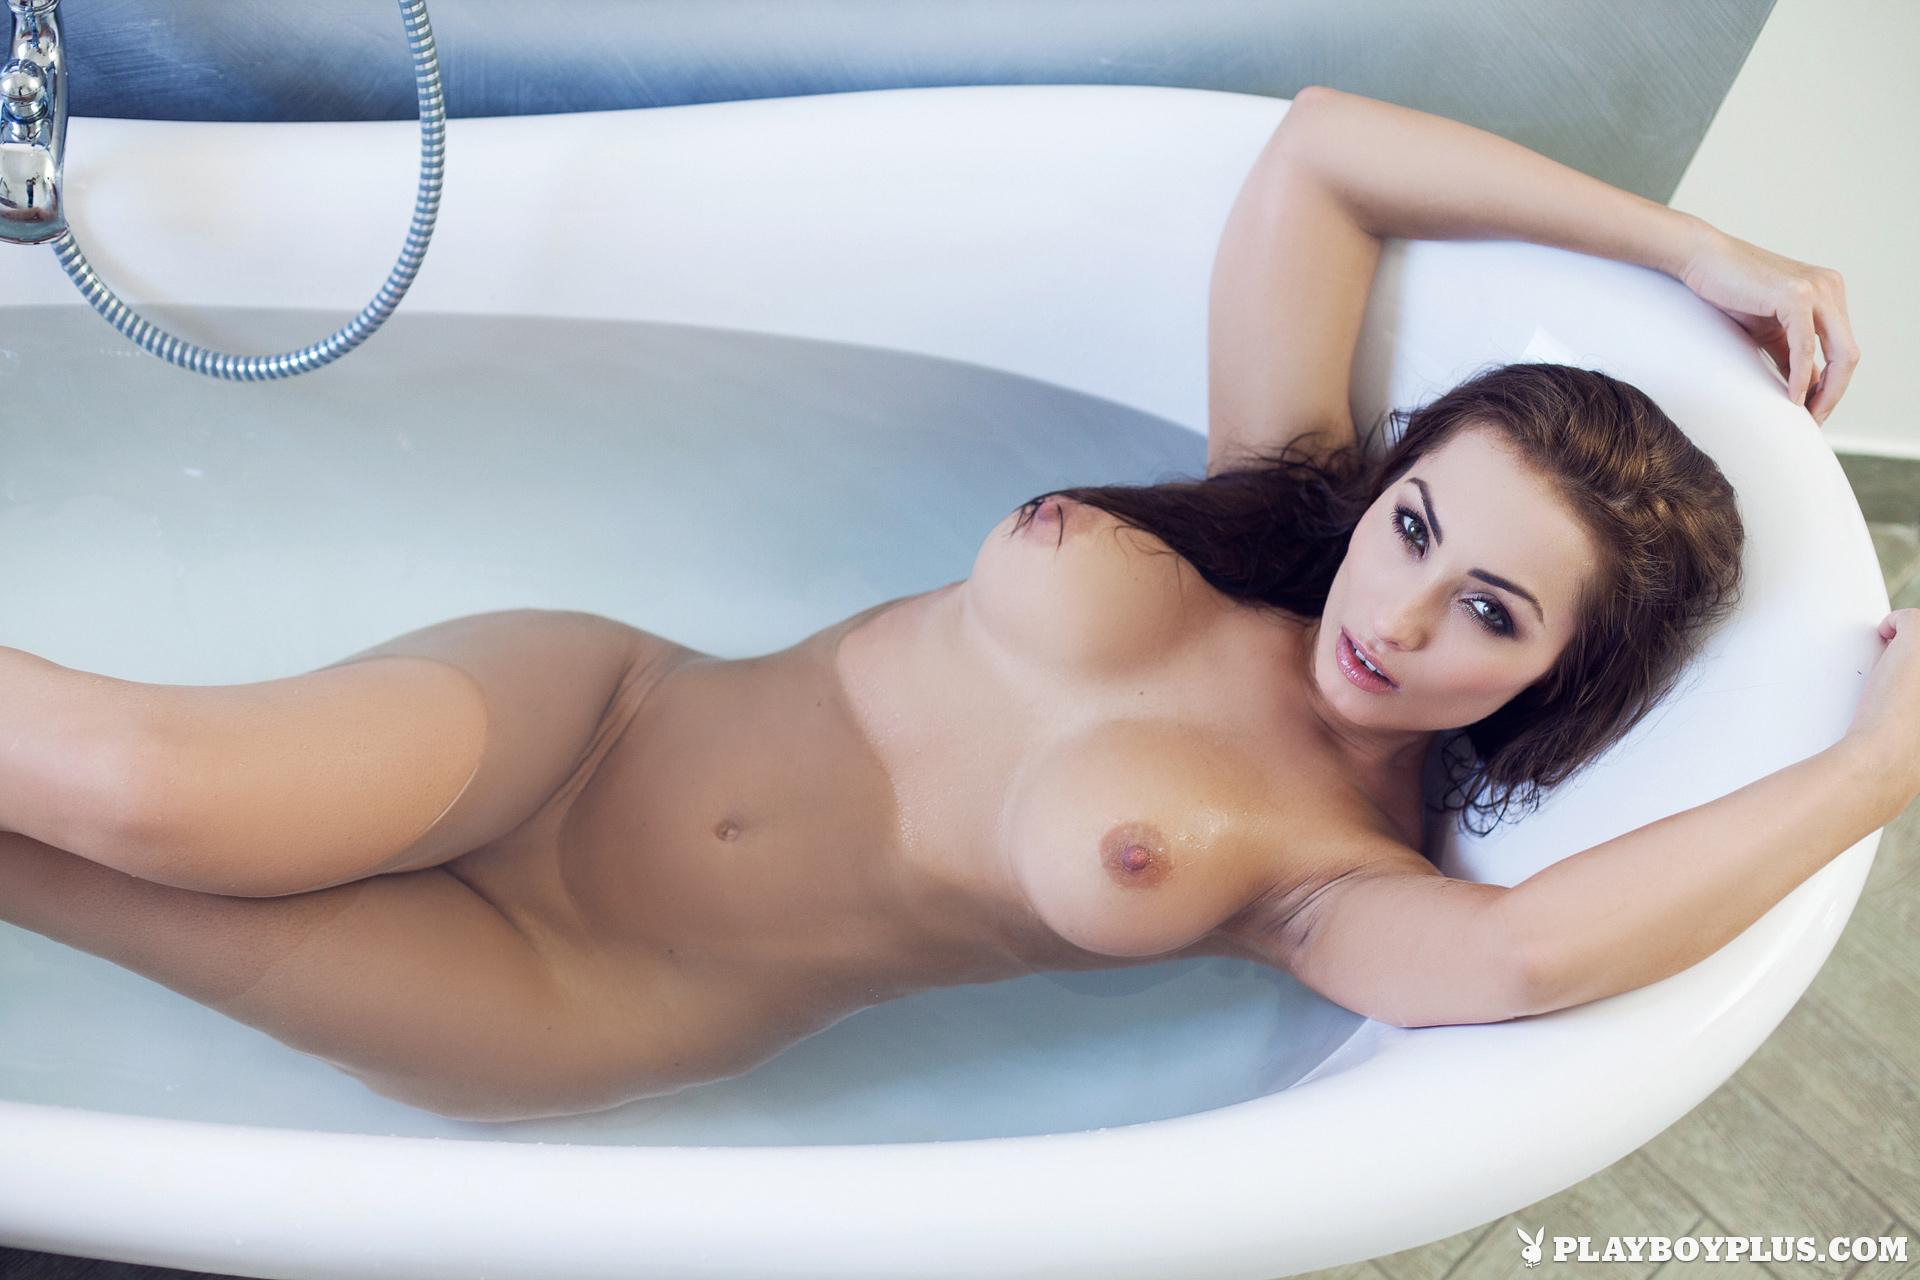 Khloe Terae, Marga Cifuentes, Szandra. Tunde, nude, bath